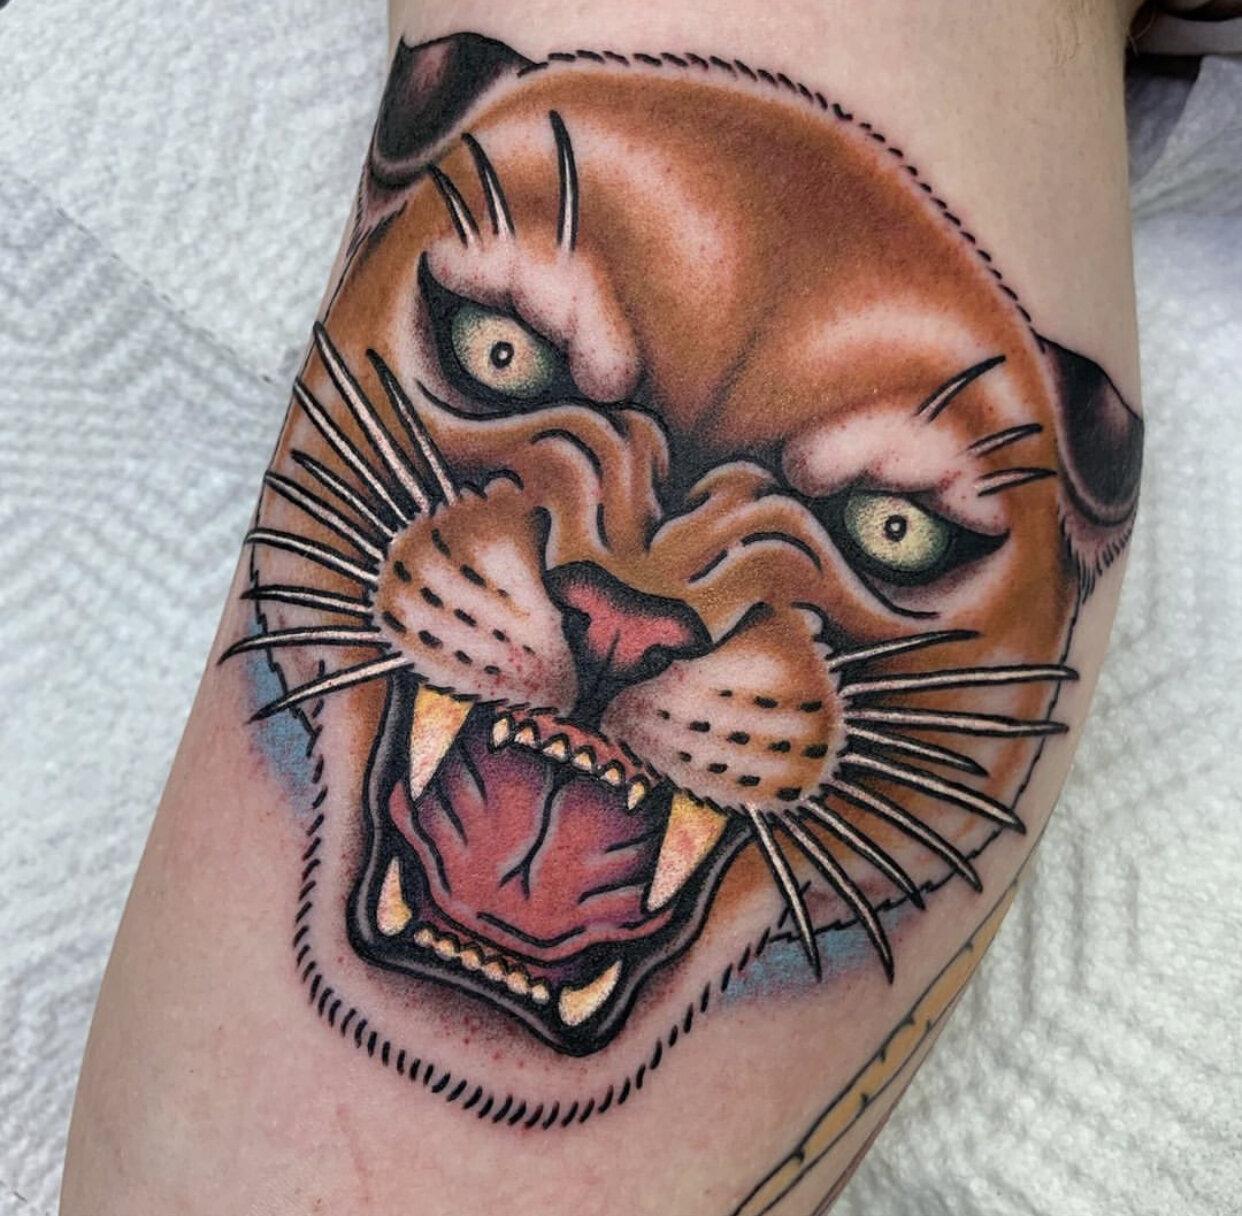 Cat-Face-Tattoo-Traditional-Stephen-Costello-Great-Wave-Tattoo-Austin-Texas.jpg